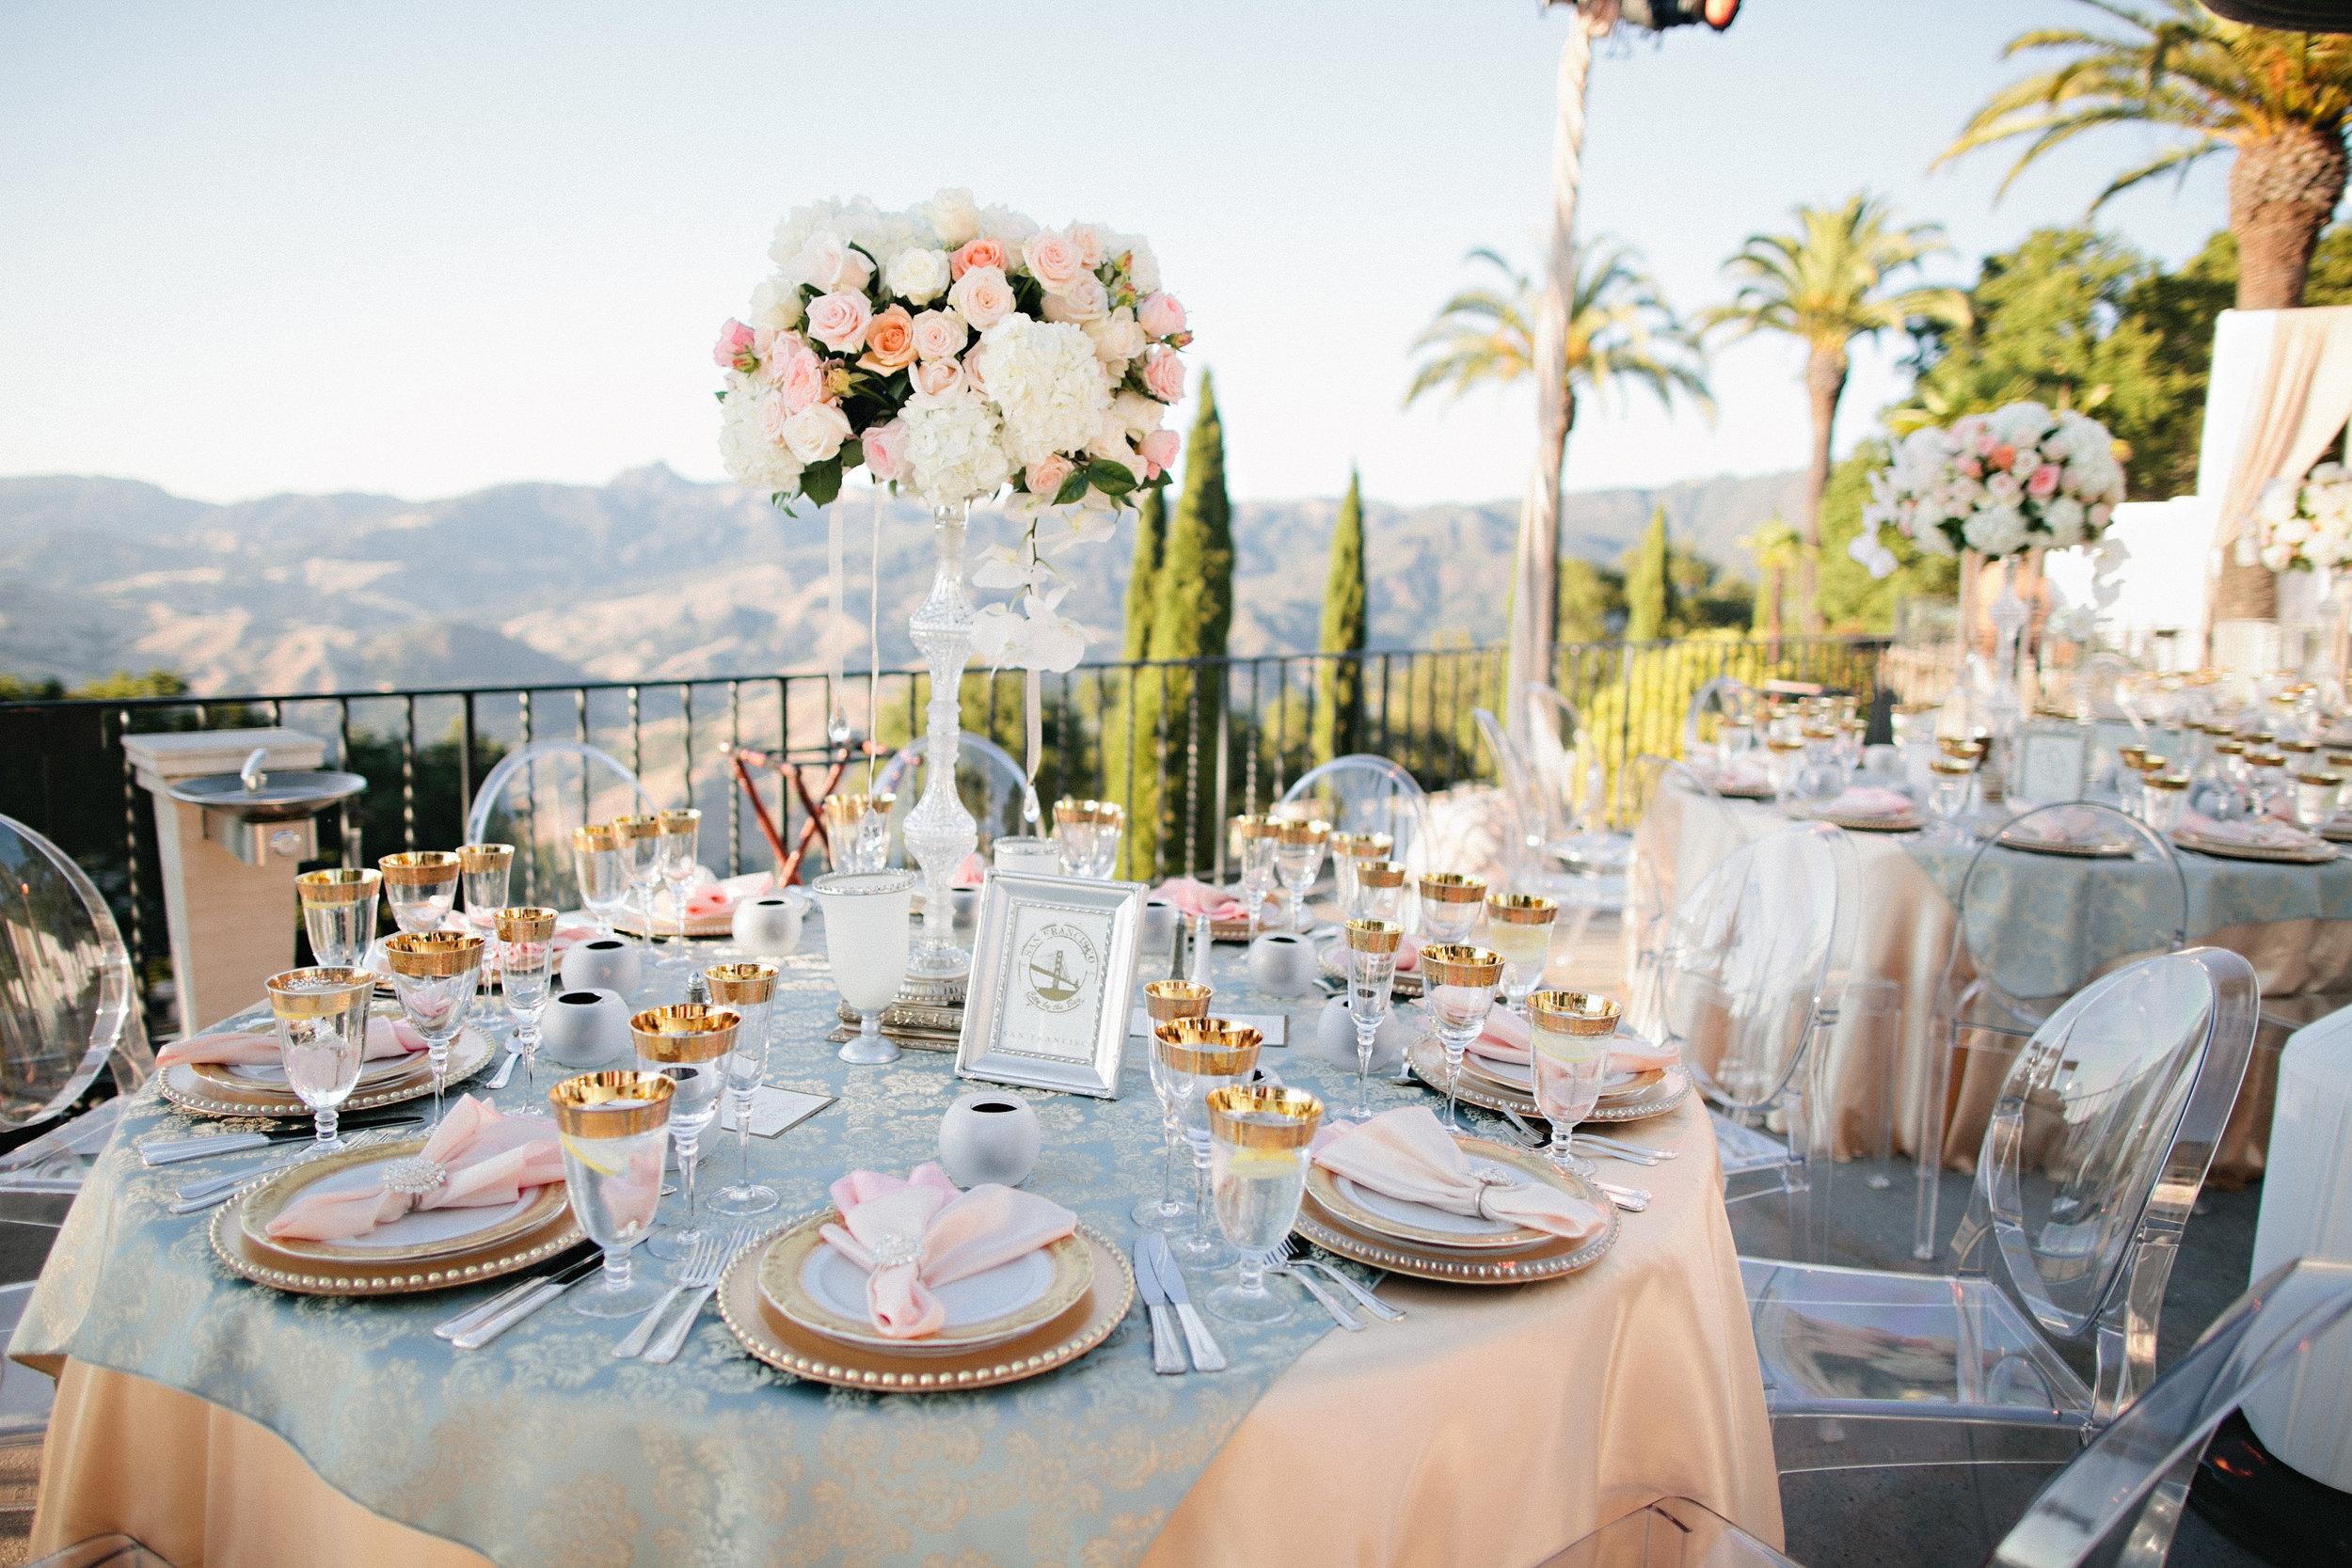 9193_linda_vu_wedding-1617000886-O.jpg